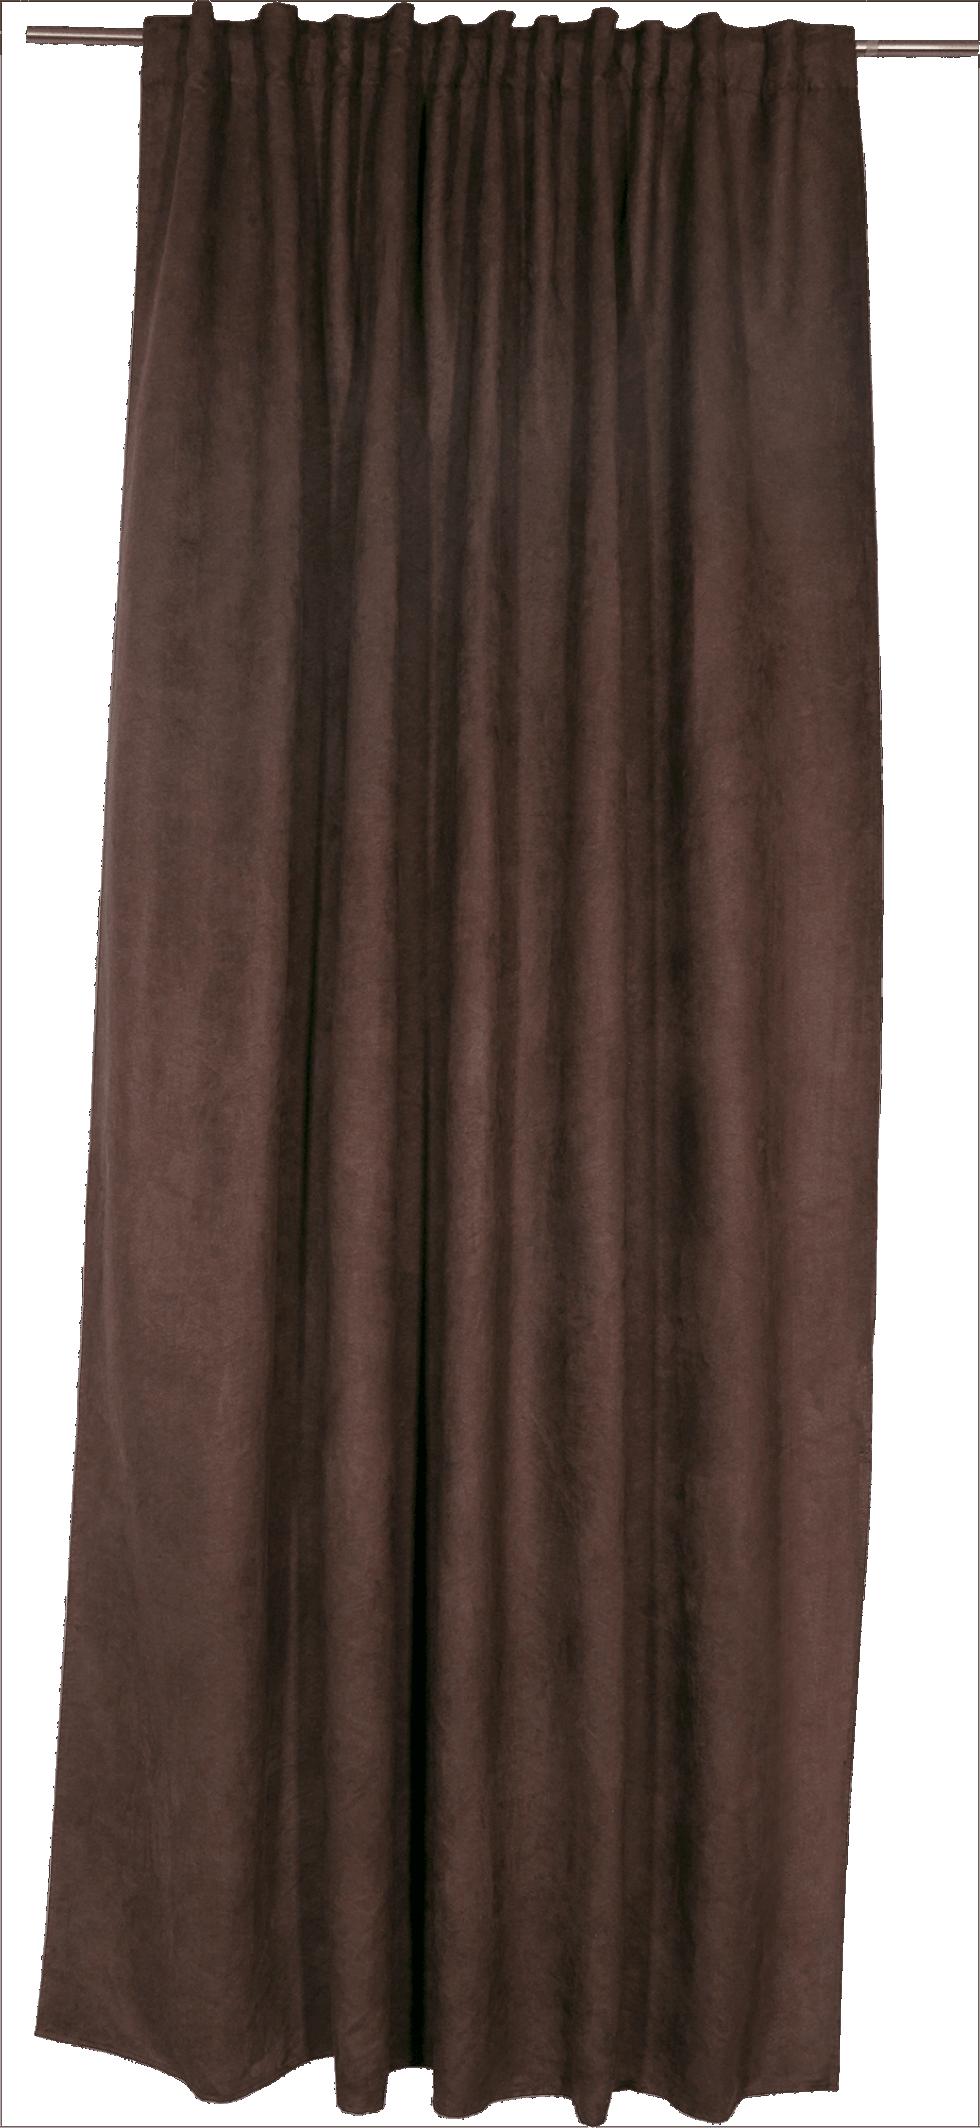 Штора на ленте «Нью Манчестер», 200х280 см, цвет шоколадный